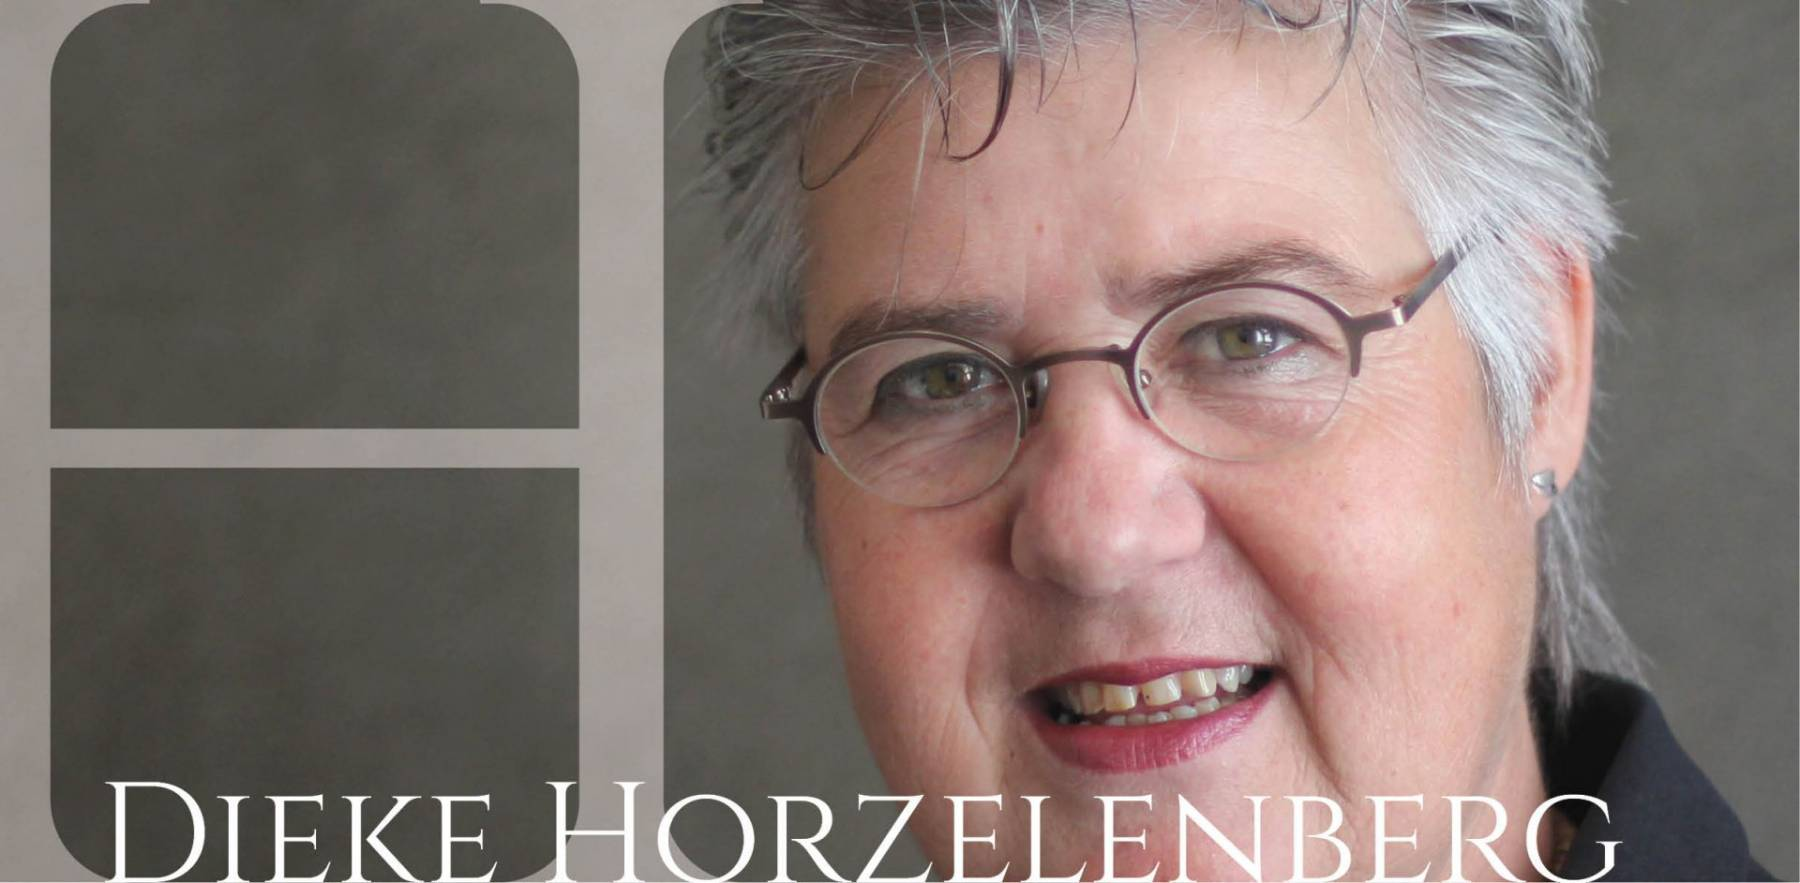 Dieke Horzelenberg